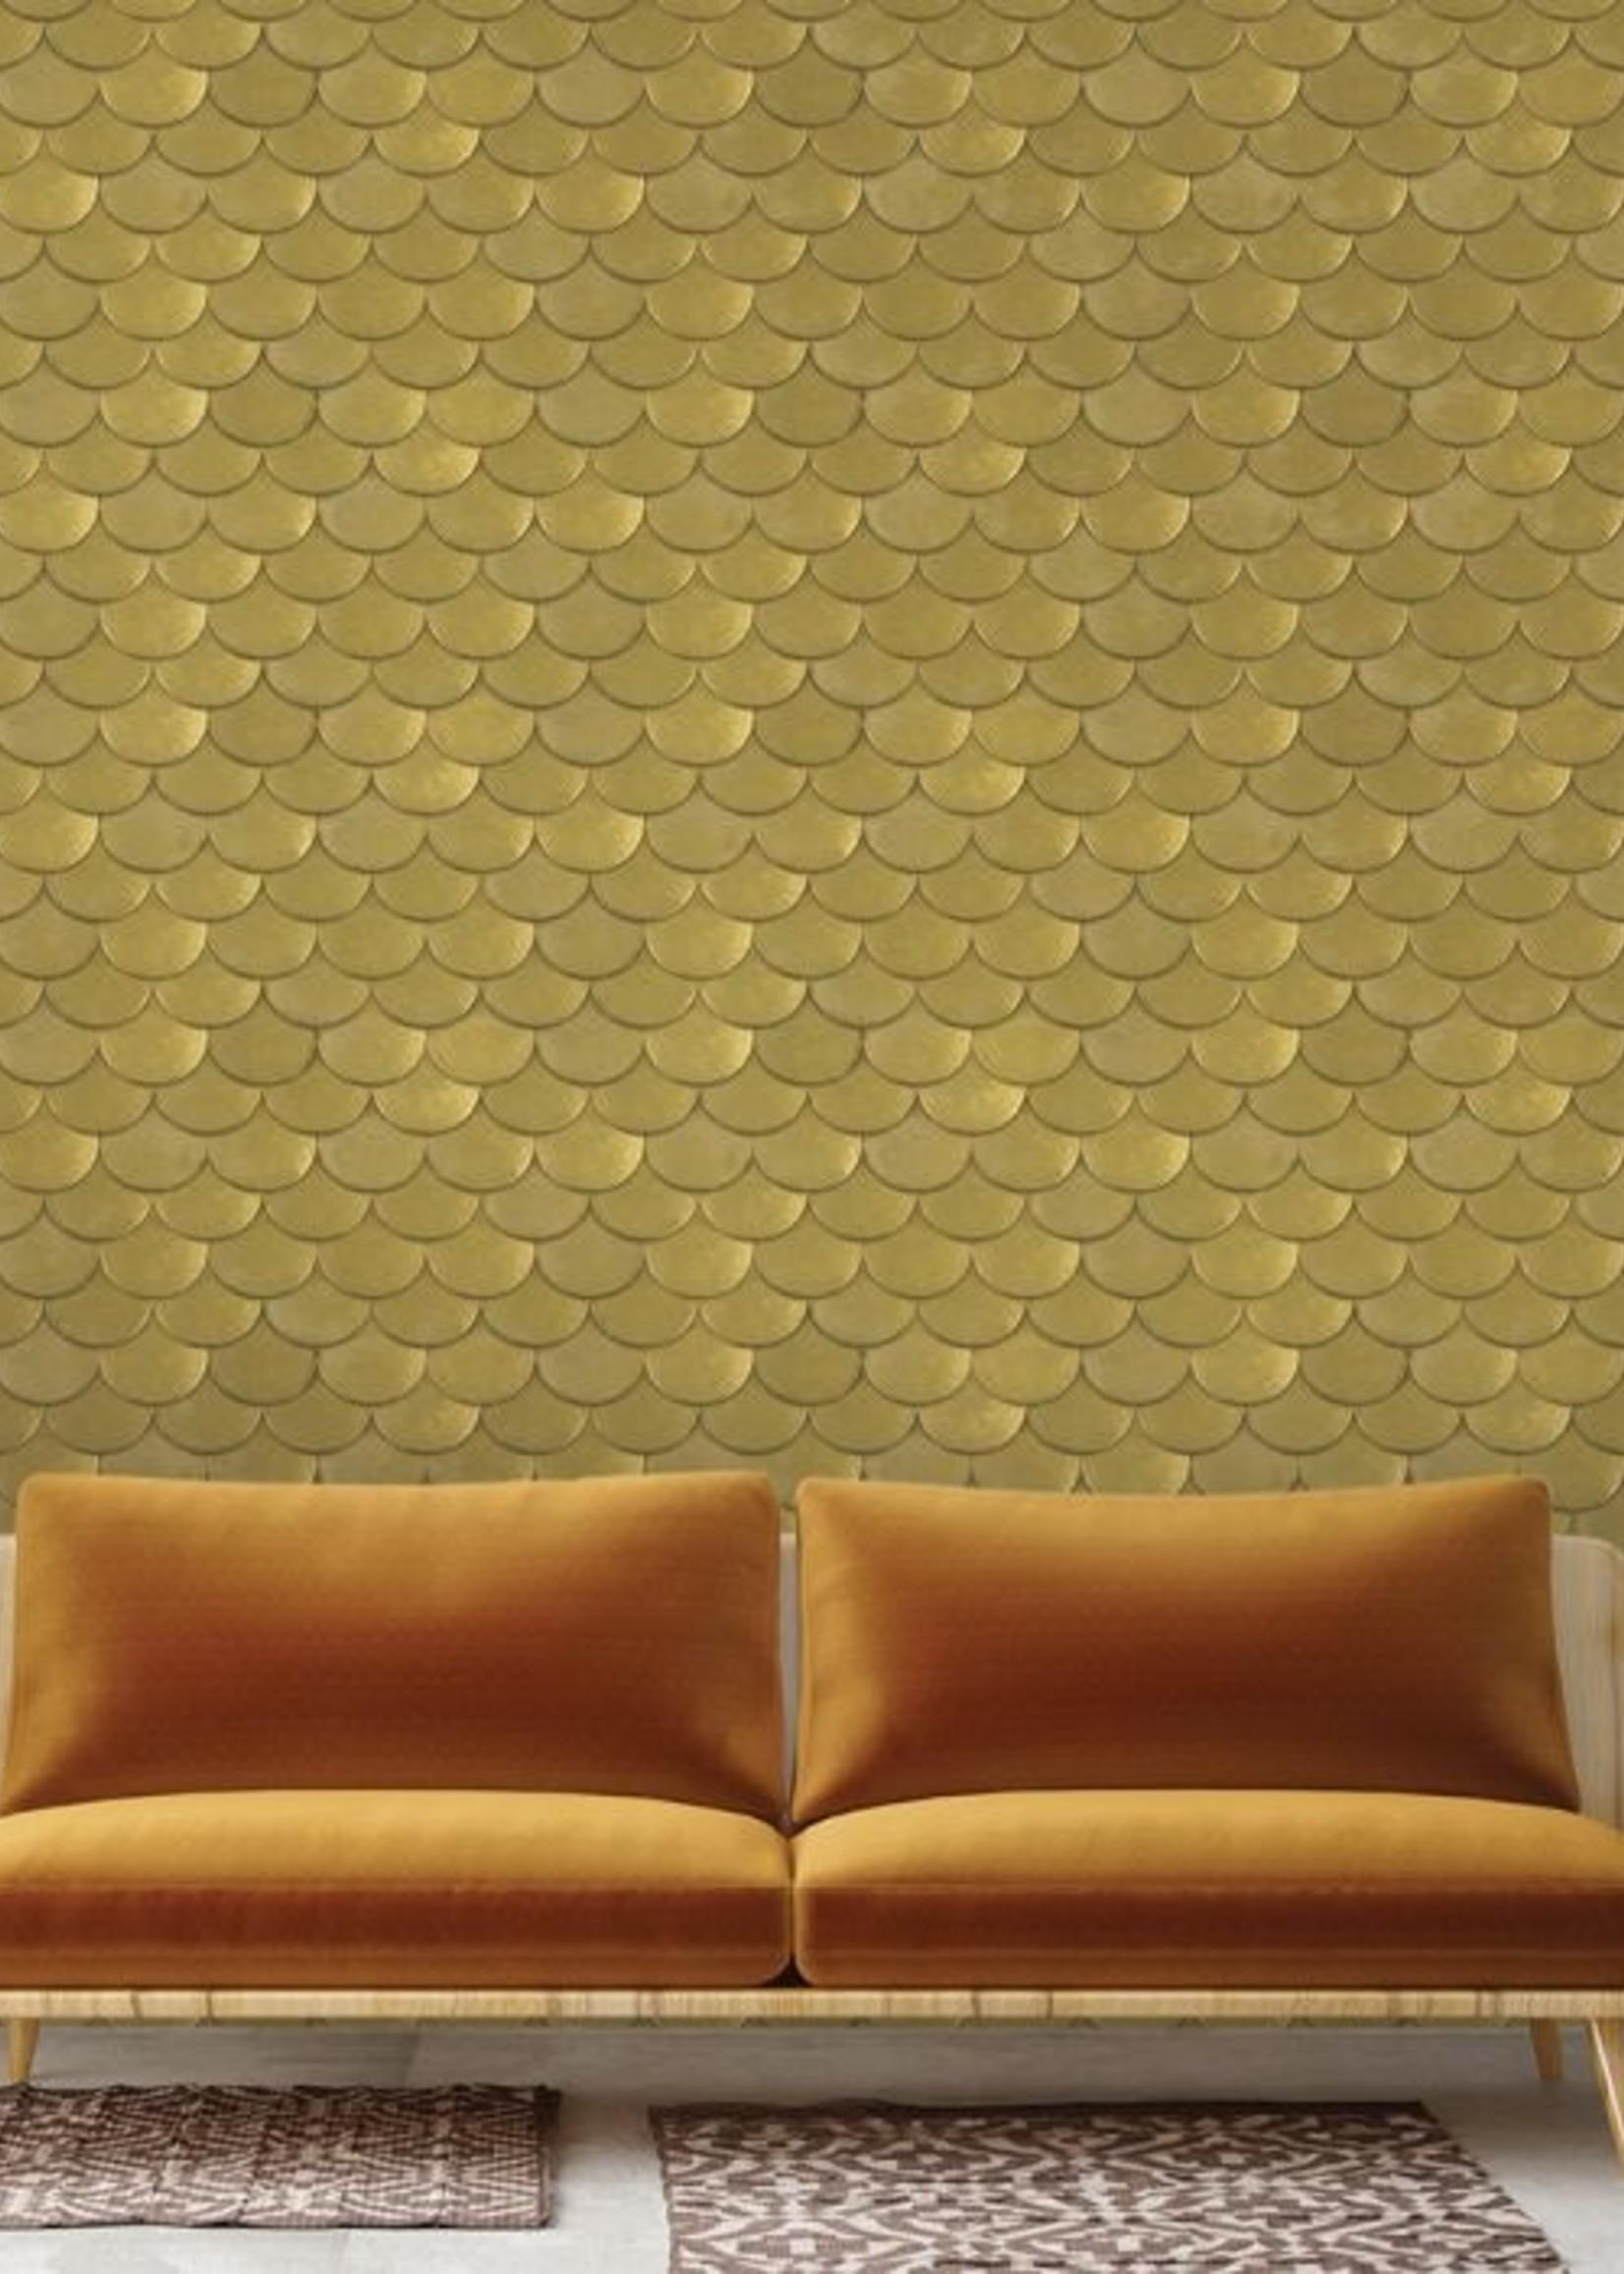 Brass Belly Old World Brass Metallic Wallpaper - double